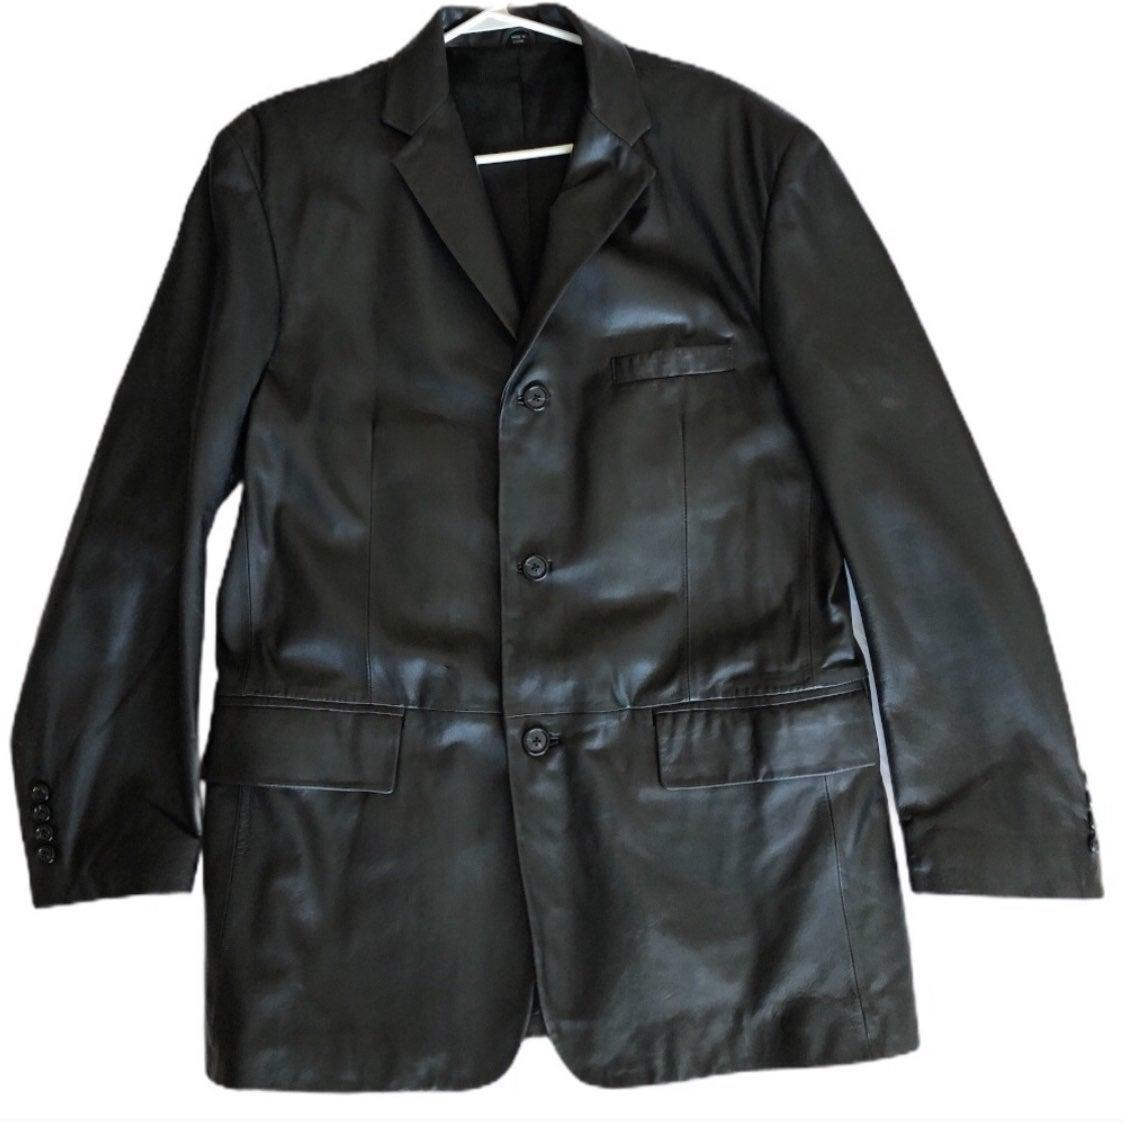 Alfani Genuine Leather Blazer / Jacket